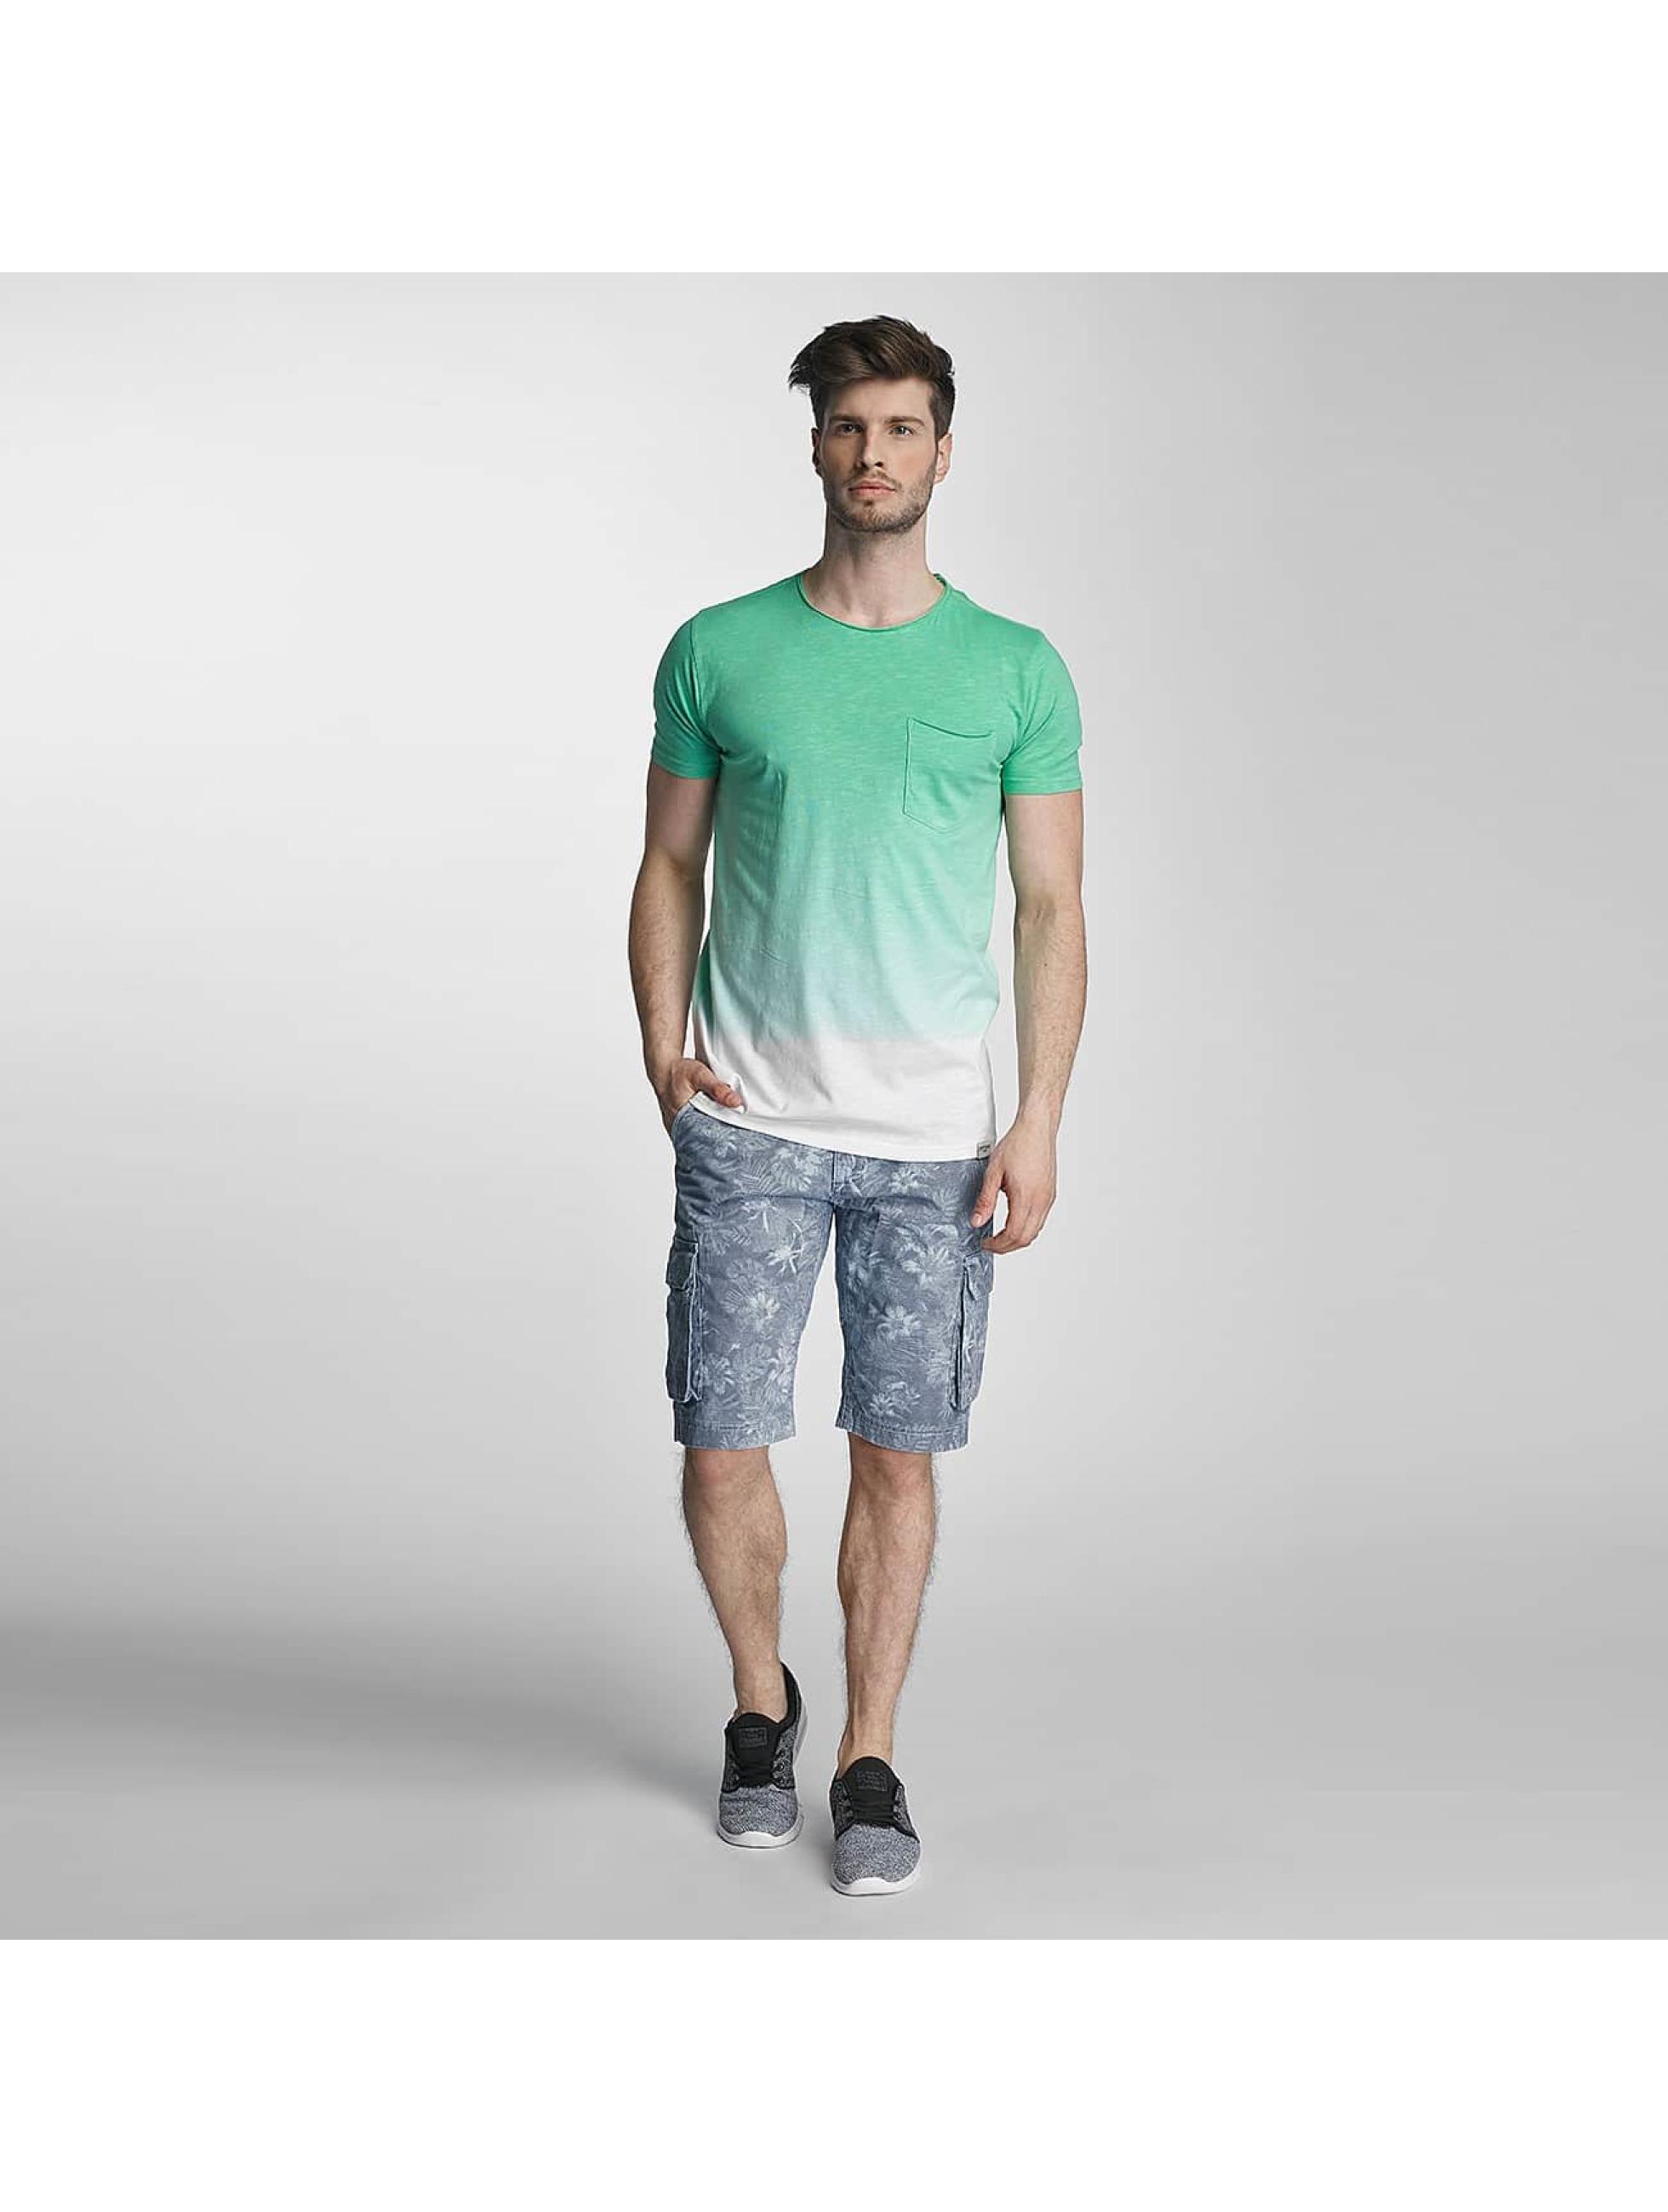 SHINE-Original-Uomini-Maglieria-T-shirt-Dip-Dyed